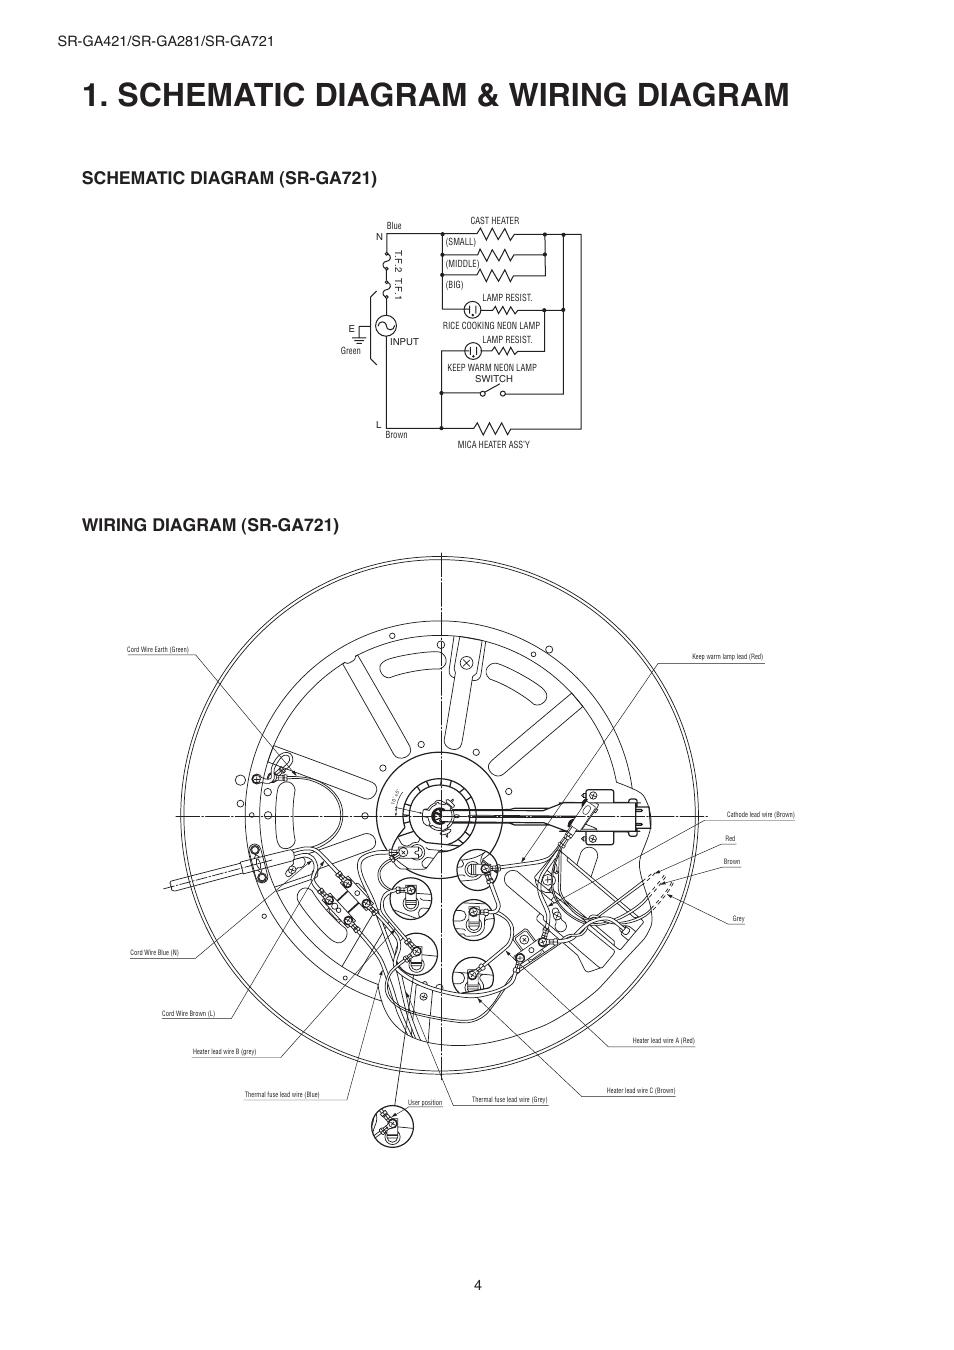 Panasonic Cq C7301u Wiring Diagram Auto Electrical 721d Grasshopper Lawn Mower 24 Images